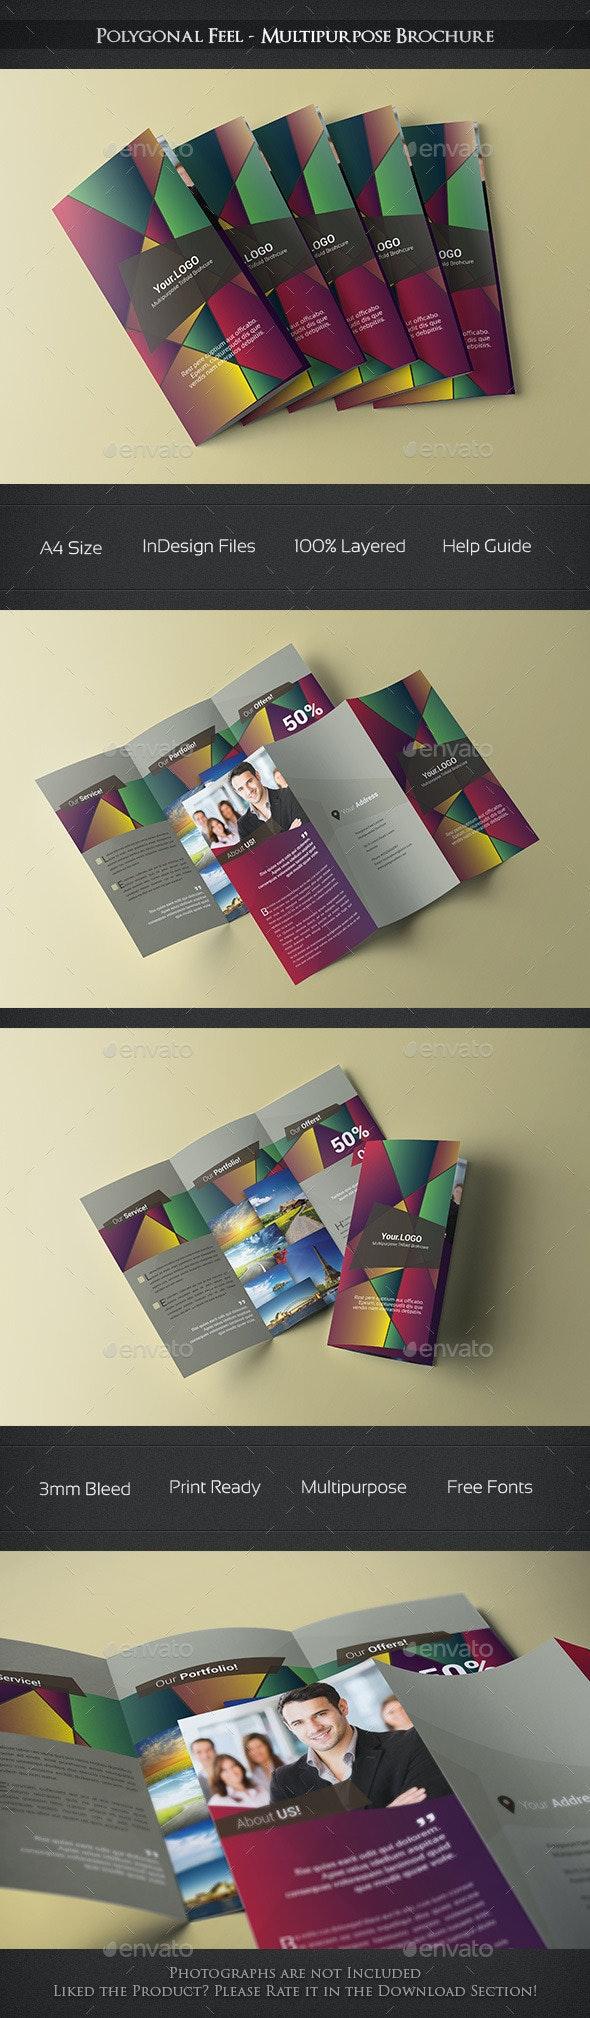 Polygonal Feel - Trifold Brochure - Corporate Brochures